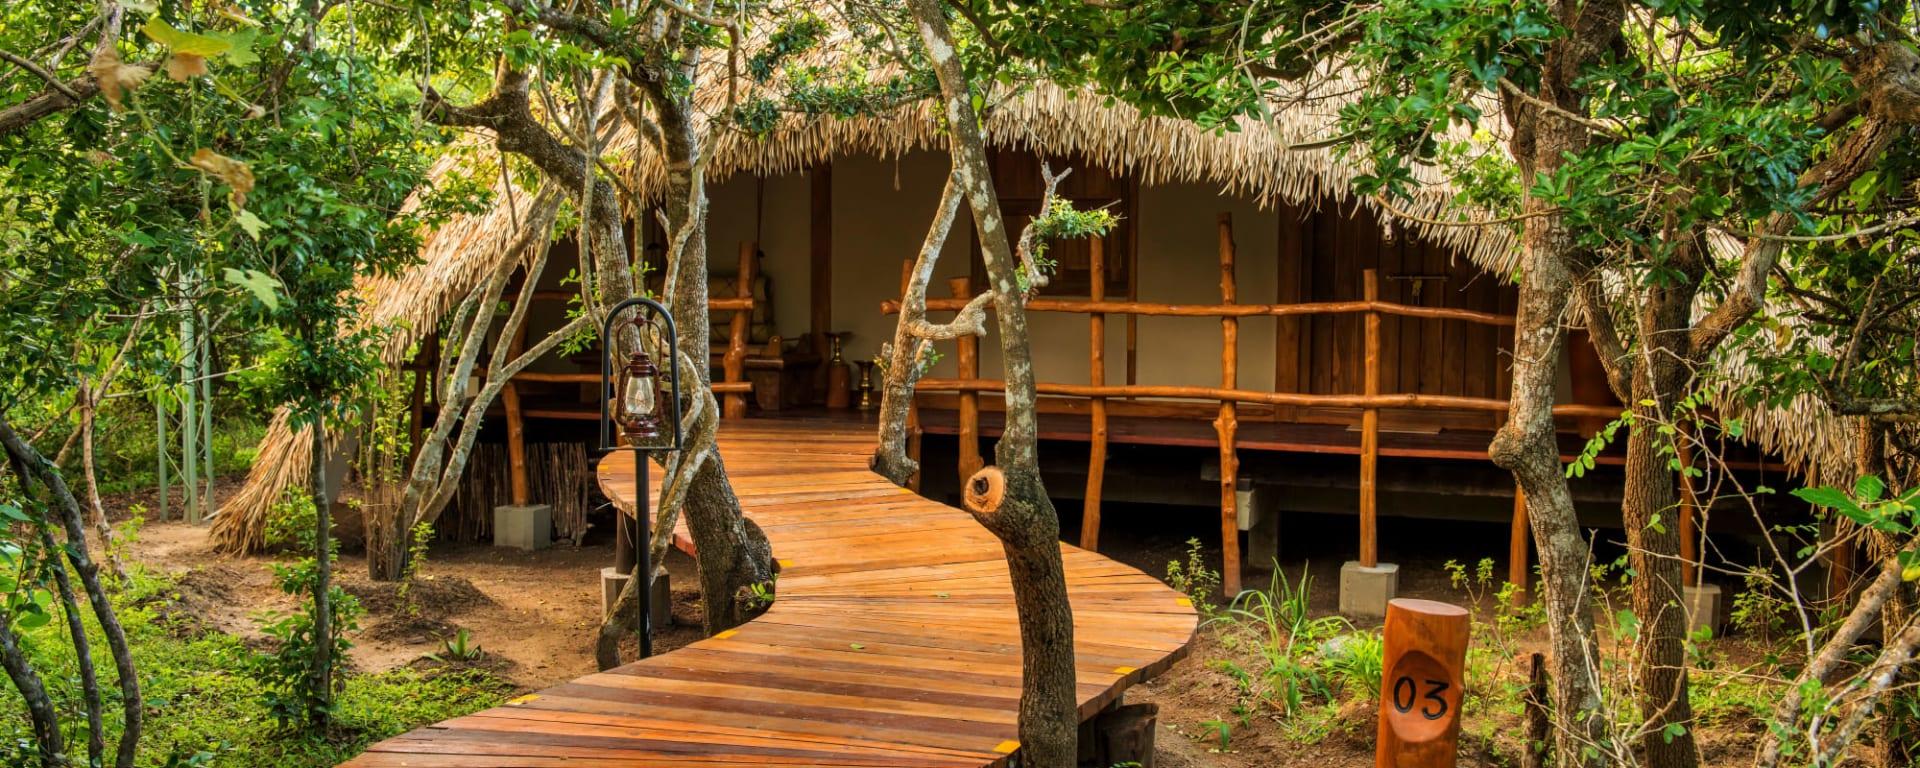 Uga Chena Huts in Yala National Park: Sri Lanka Chena Huts